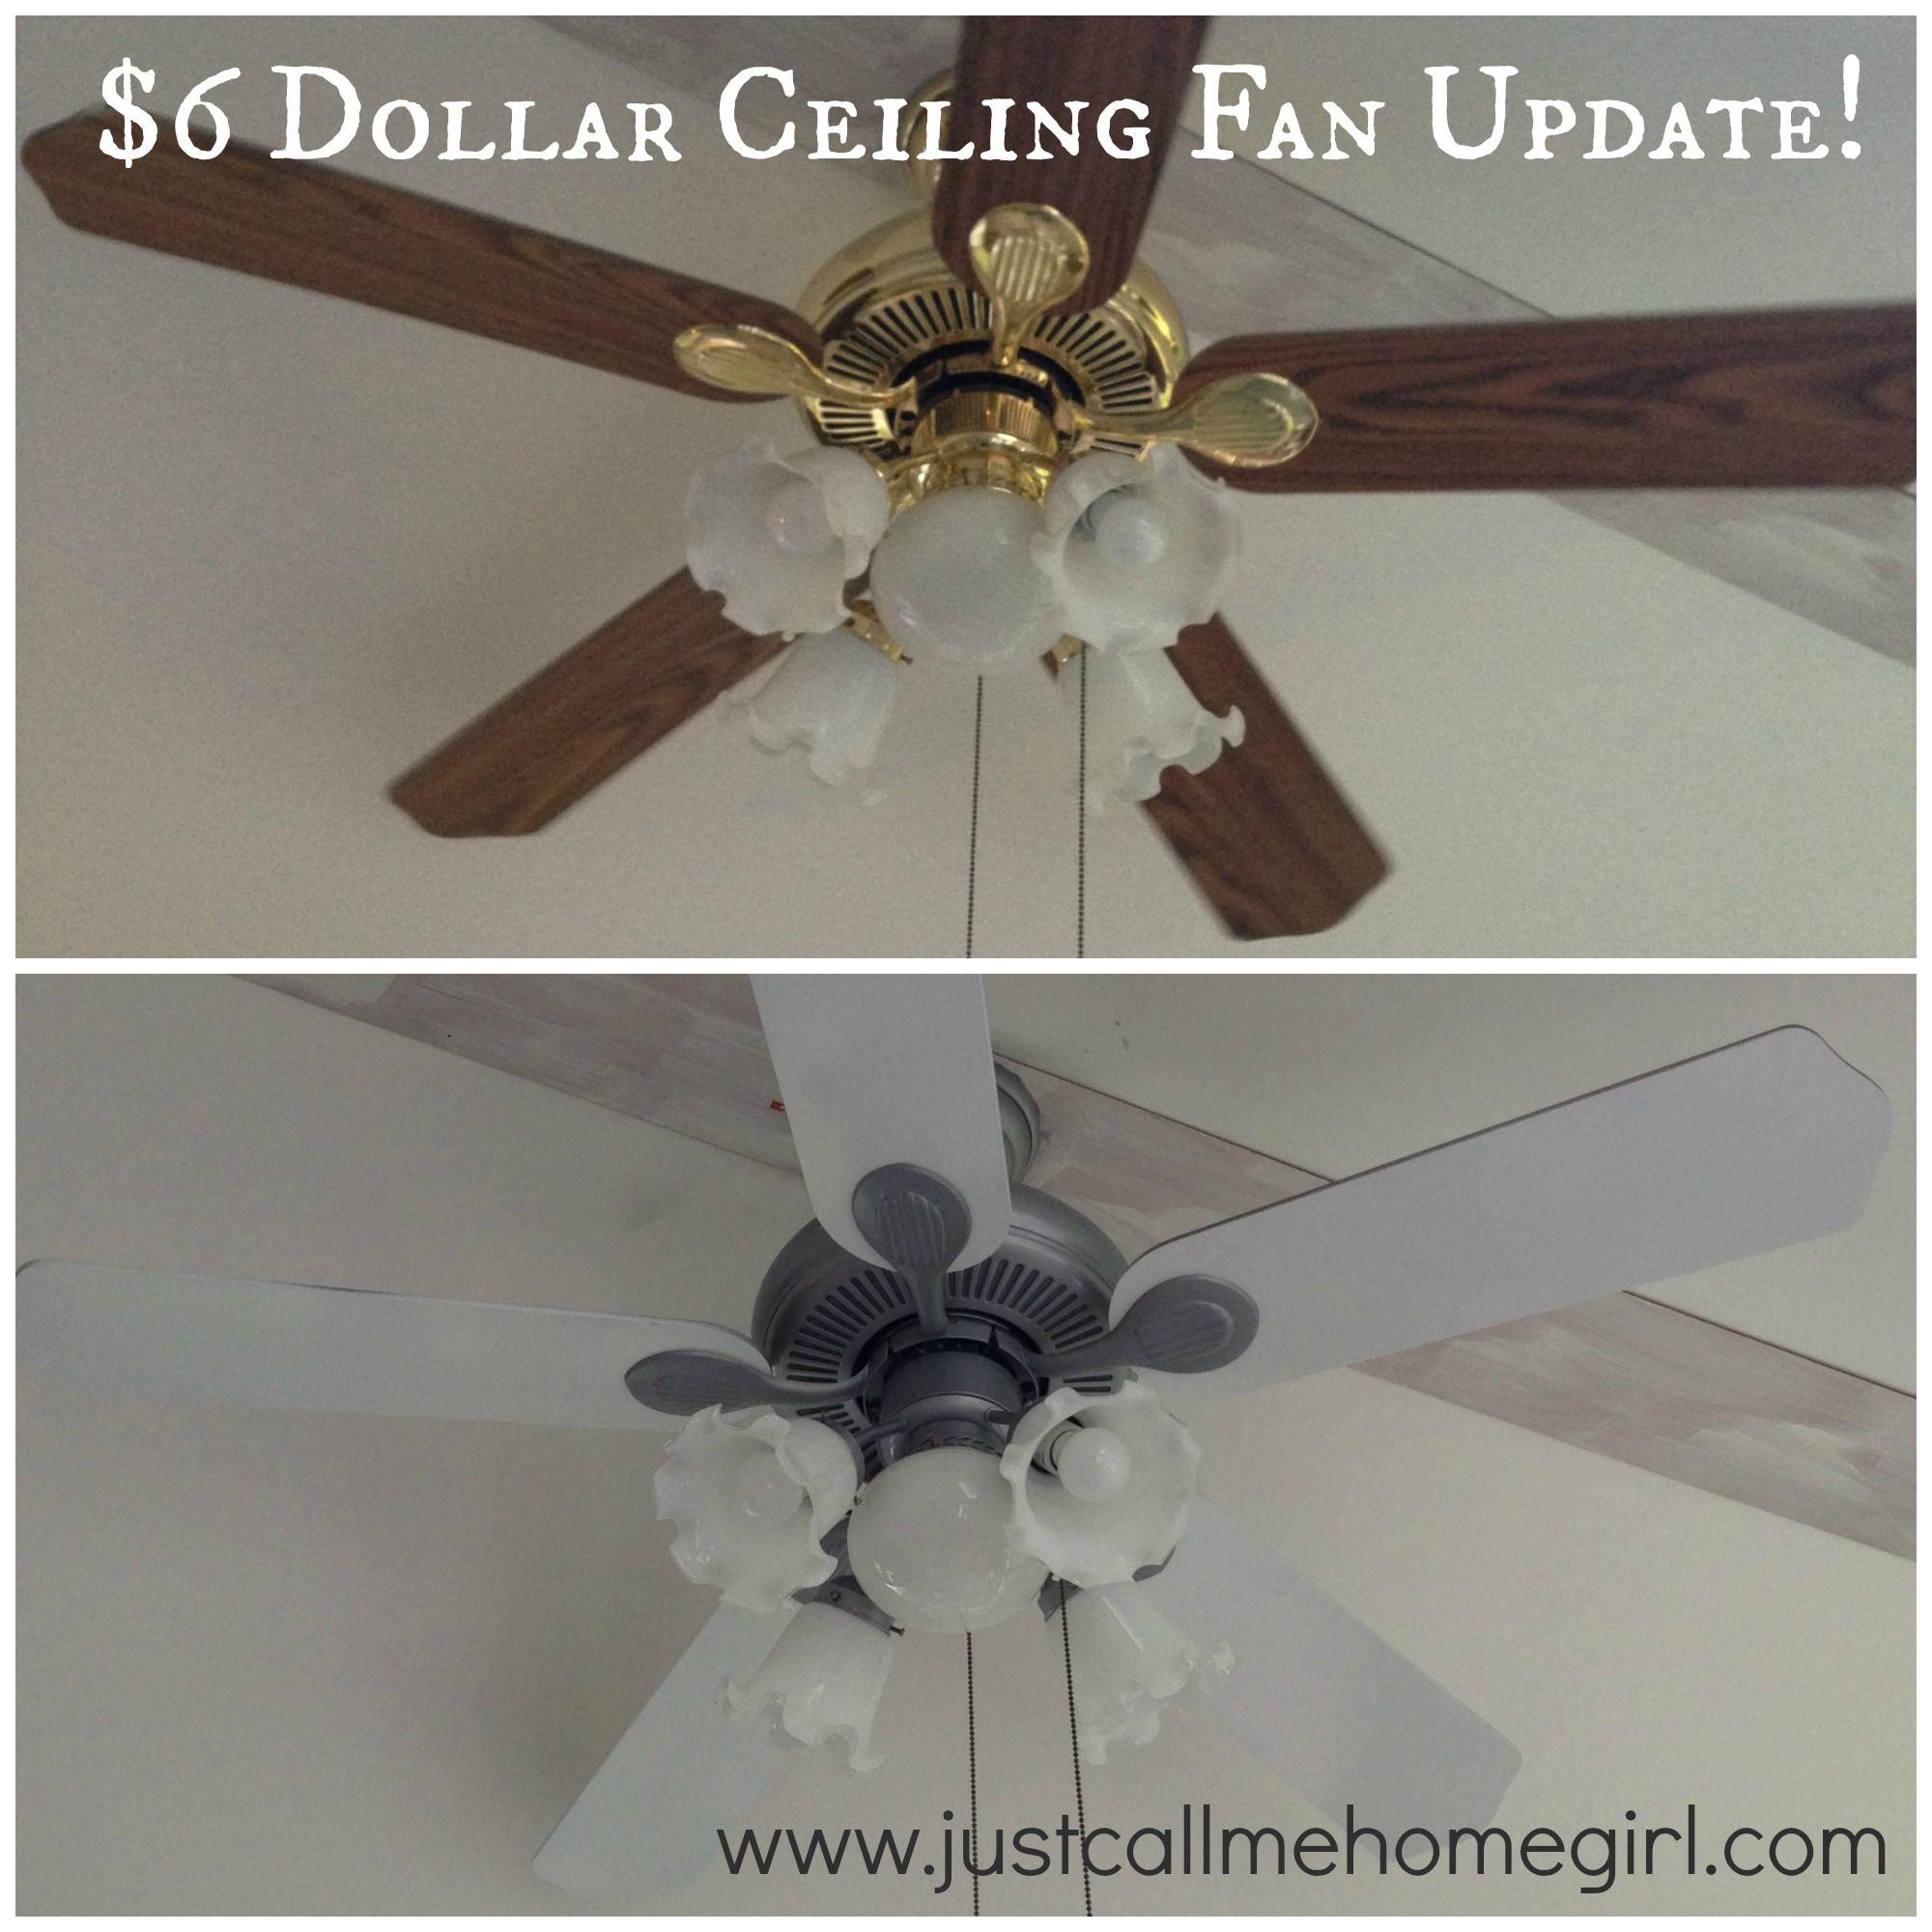 Best 25+ Ceiling fans for sale ideas on Pinterest | House ...